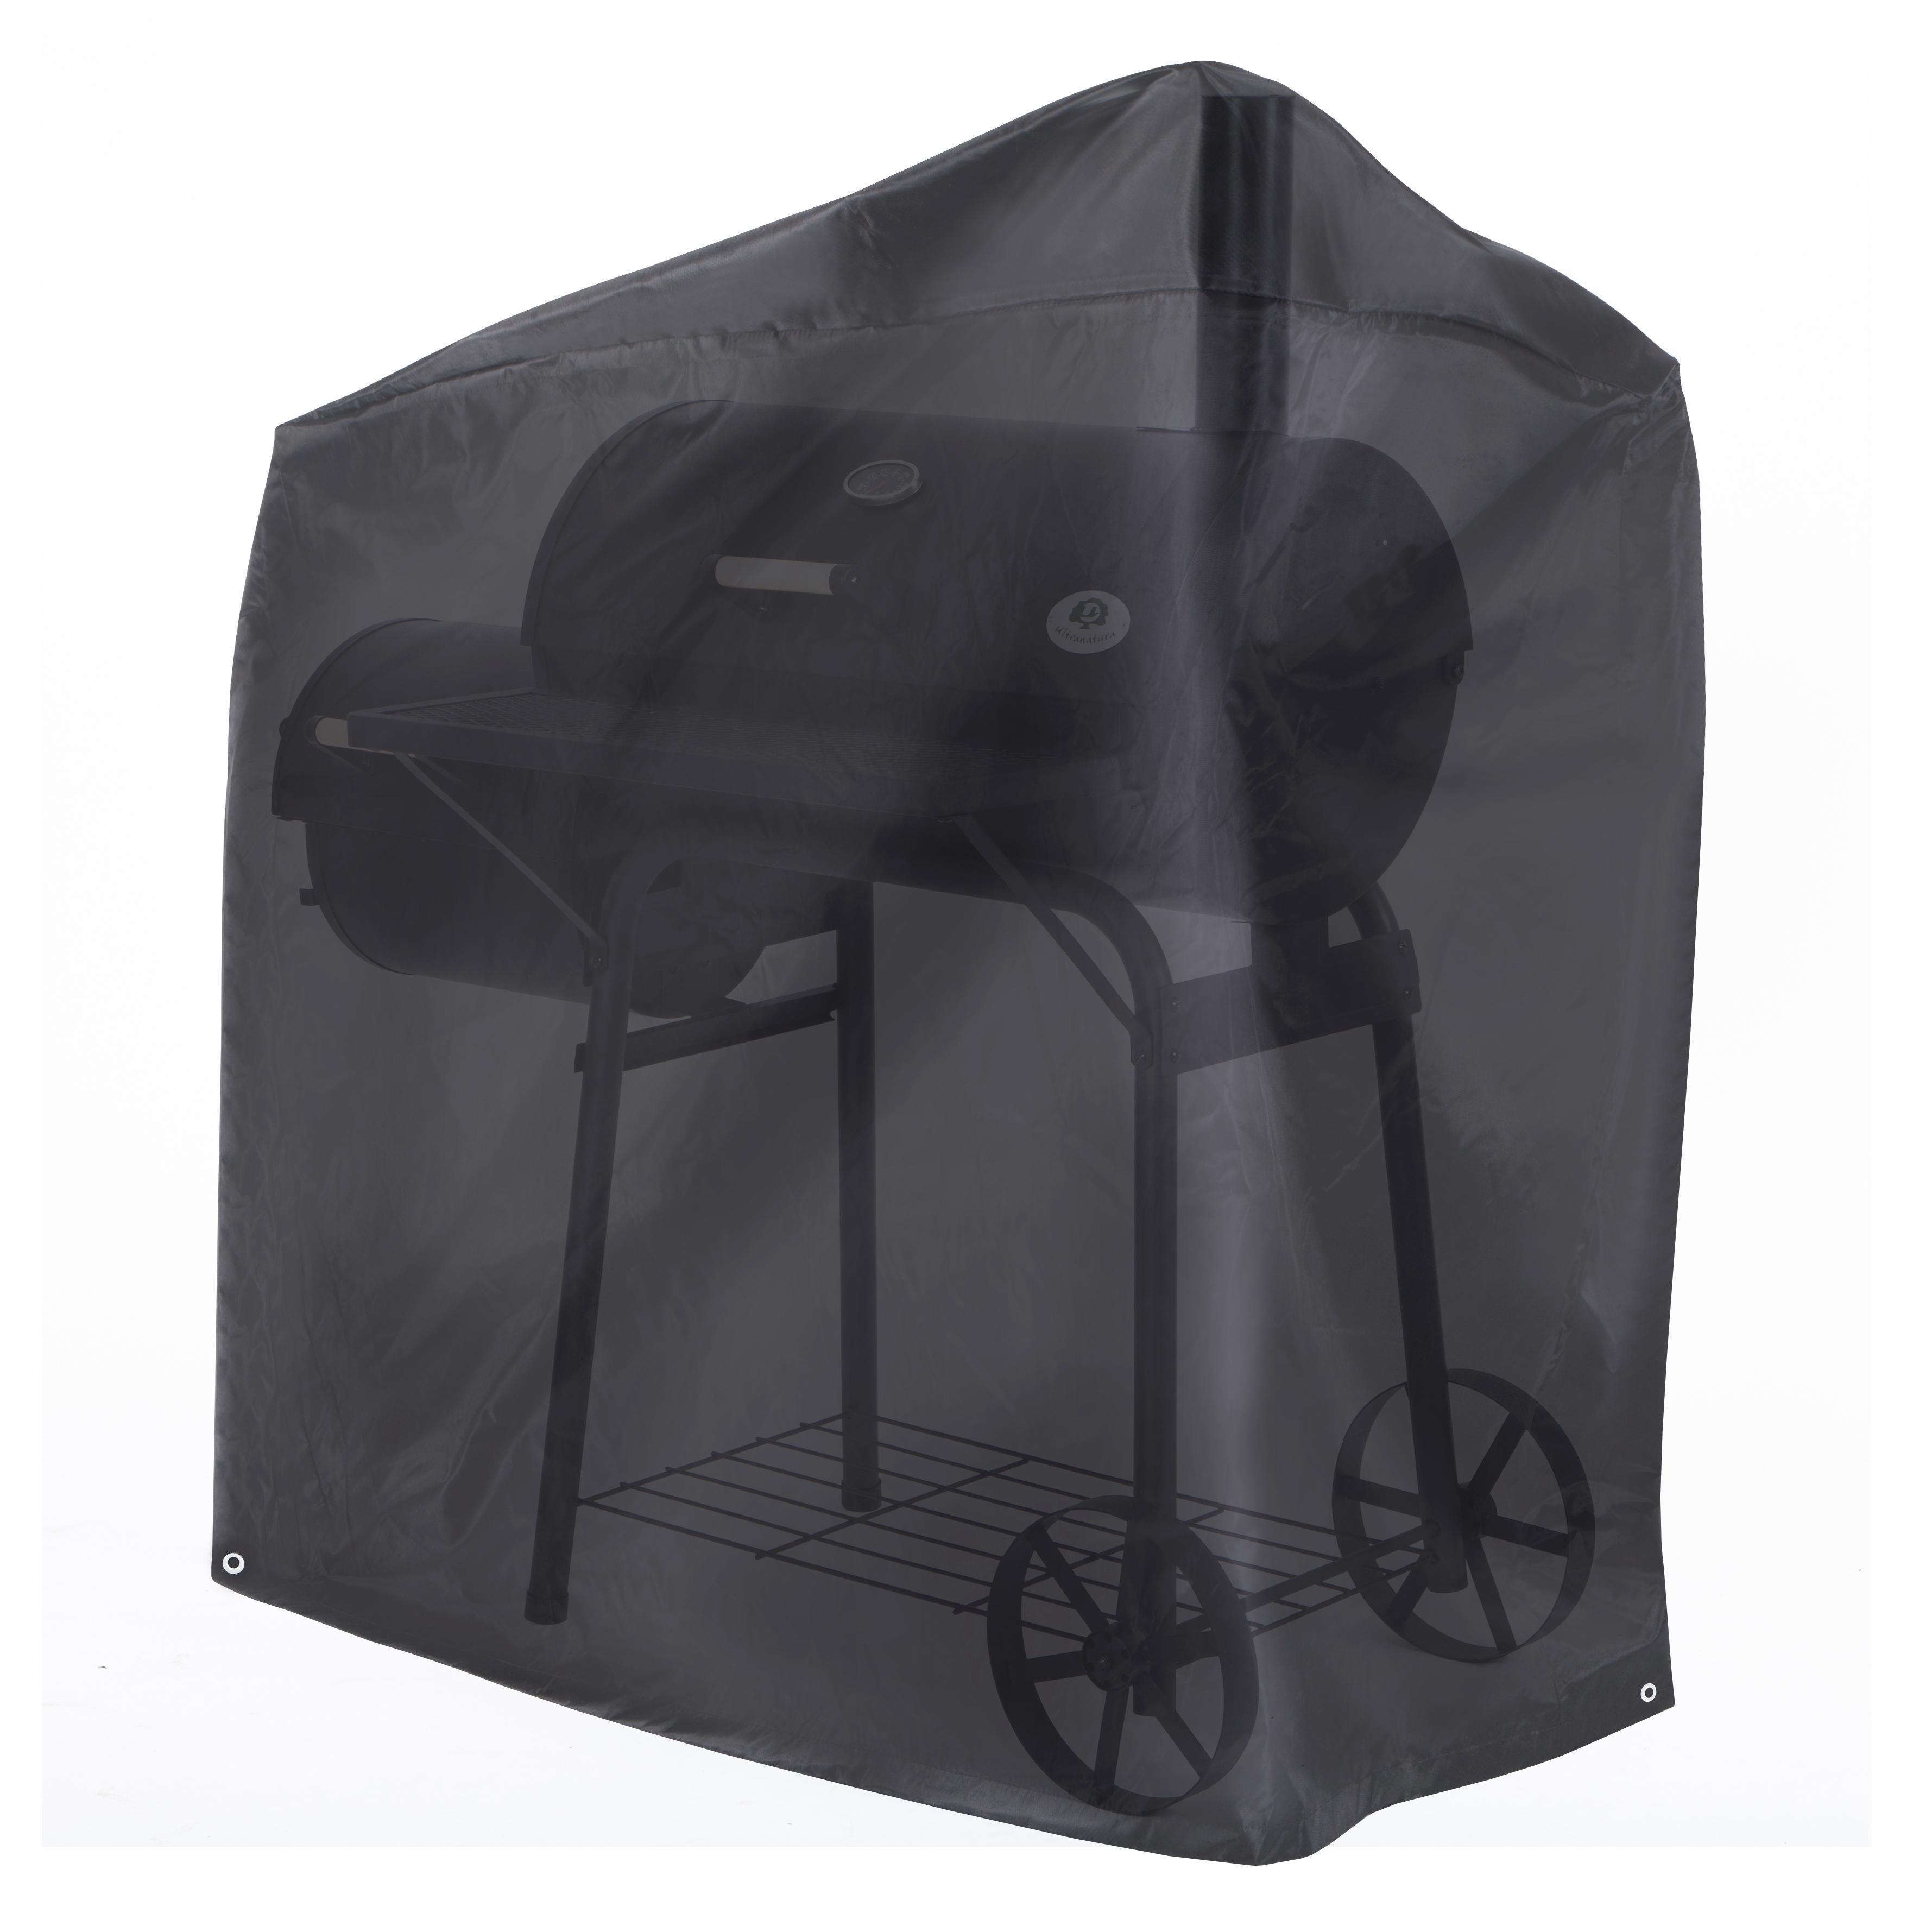 ultranatura barbecue grill h lle chateau wetterfeste. Black Bedroom Furniture Sets. Home Design Ideas